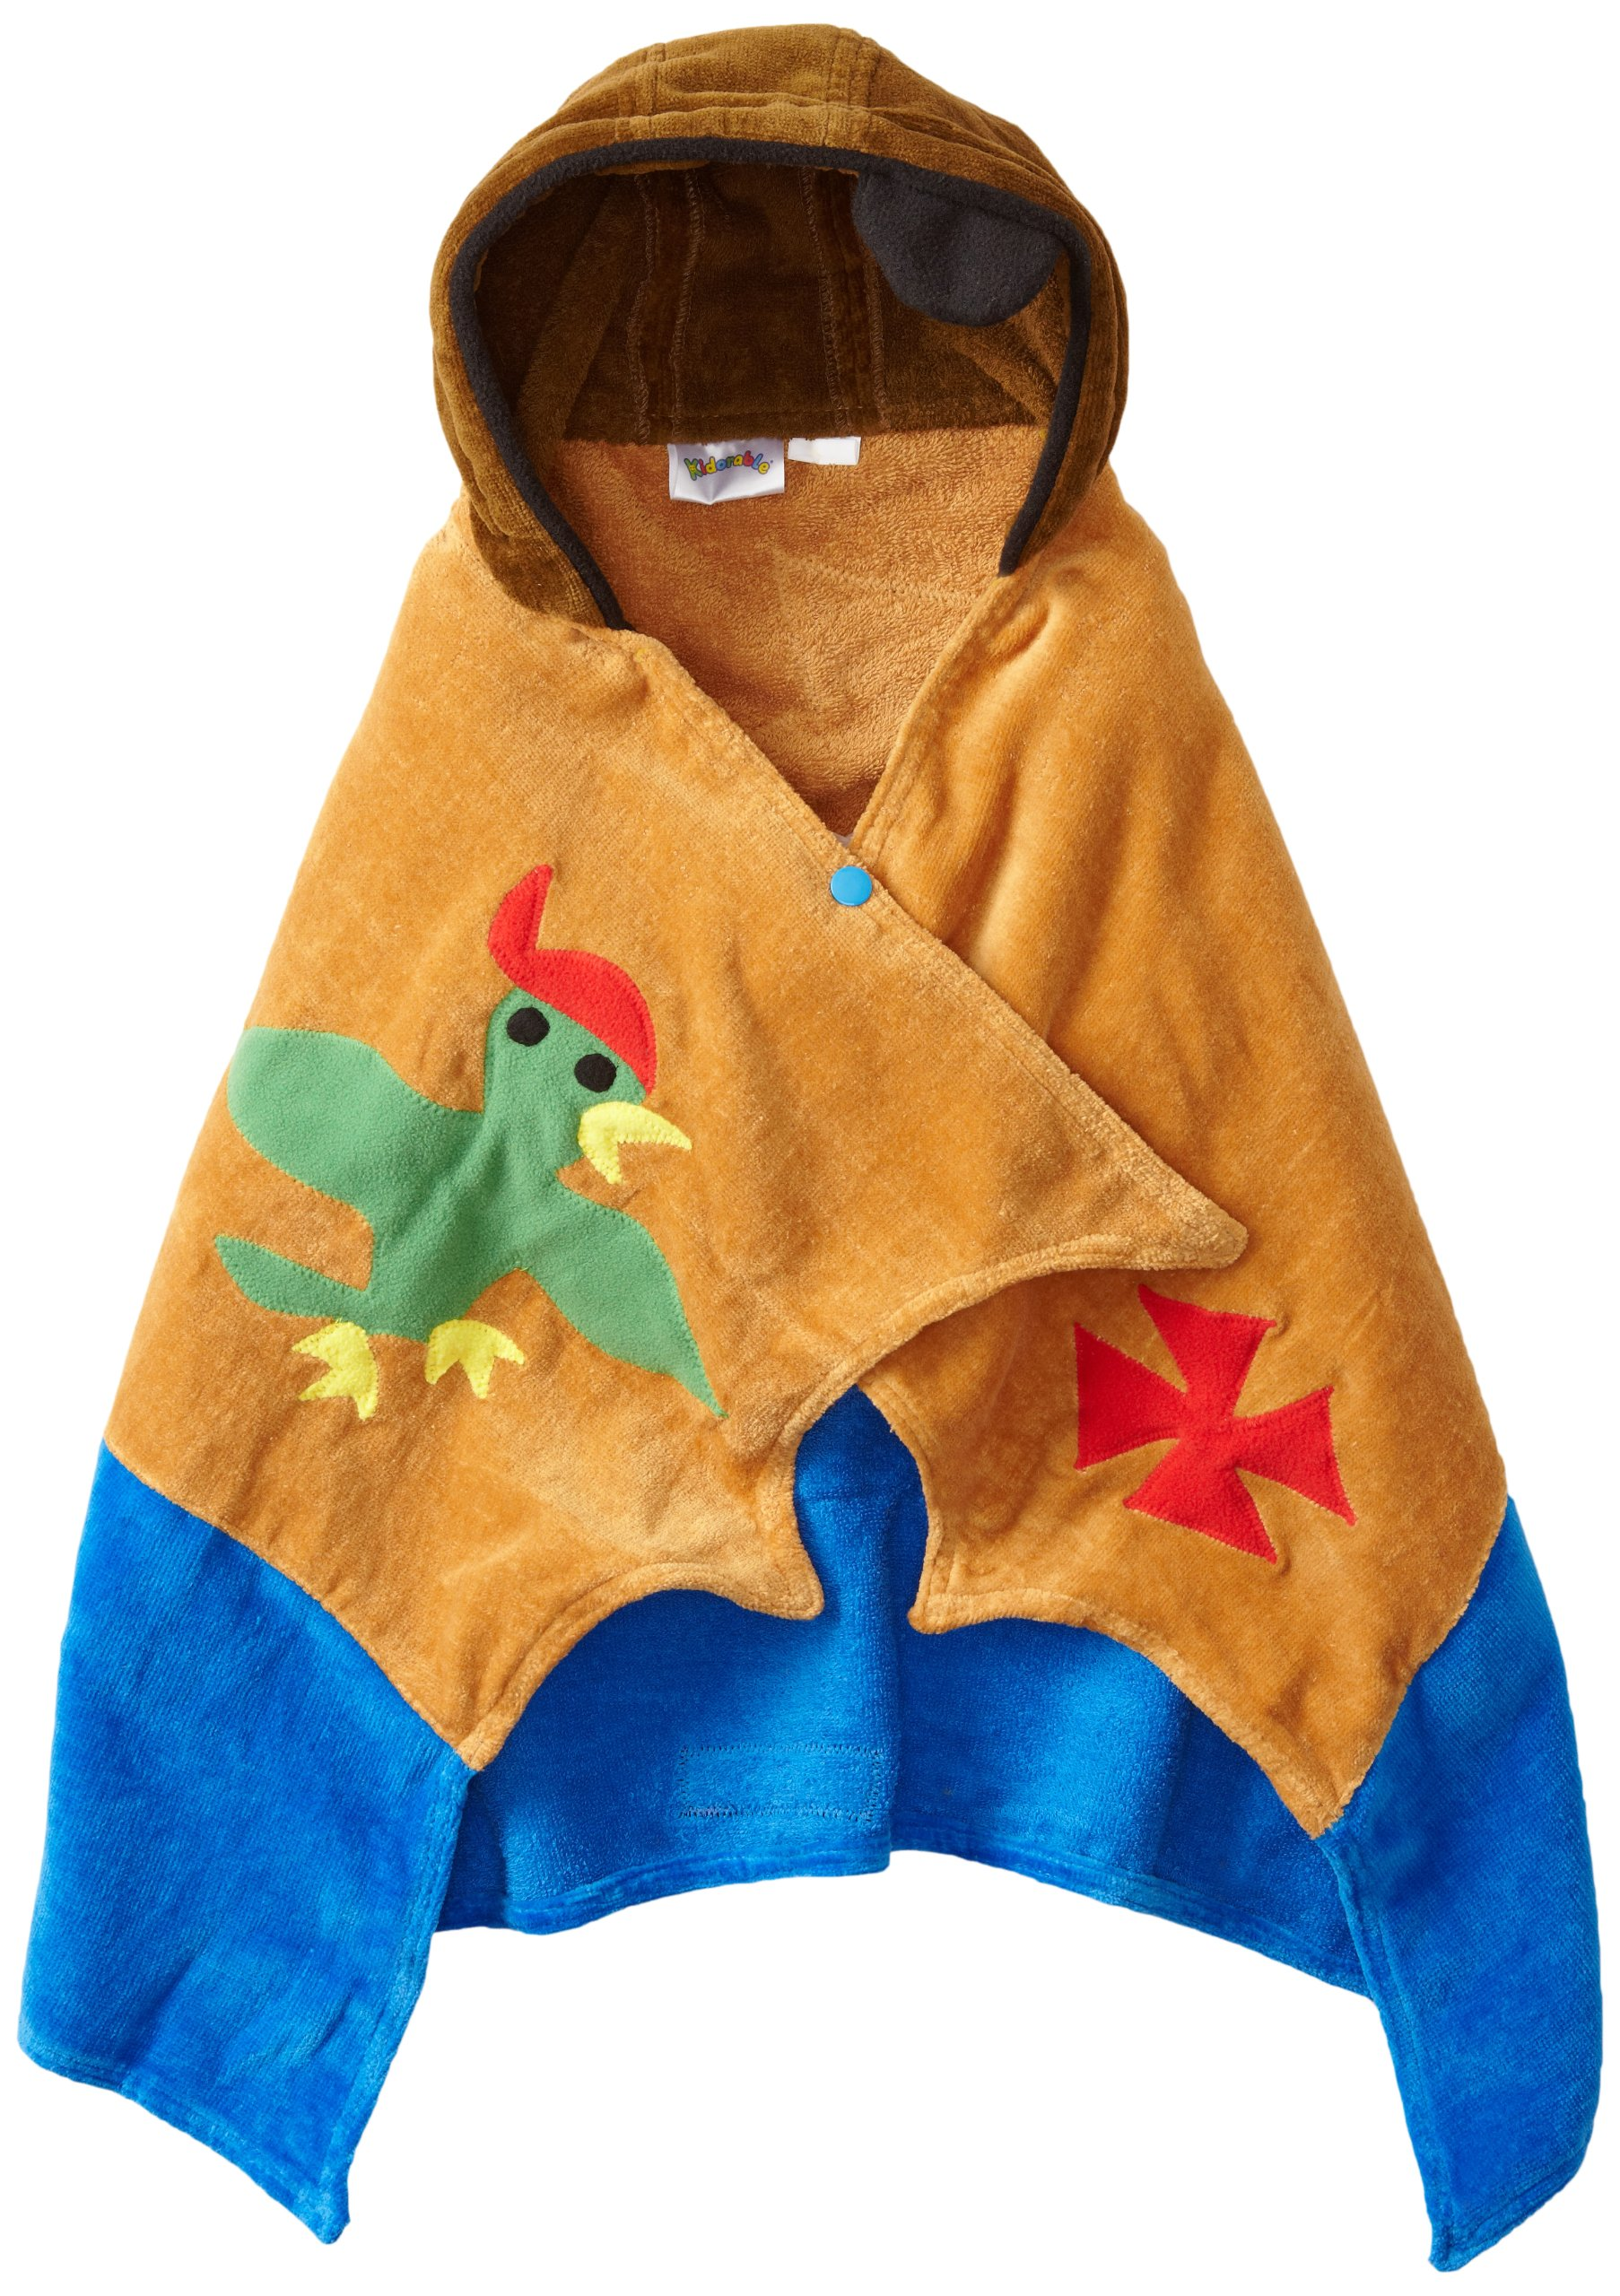 Kidorable Pirate Infant Towel, Brown, 0-3 Years